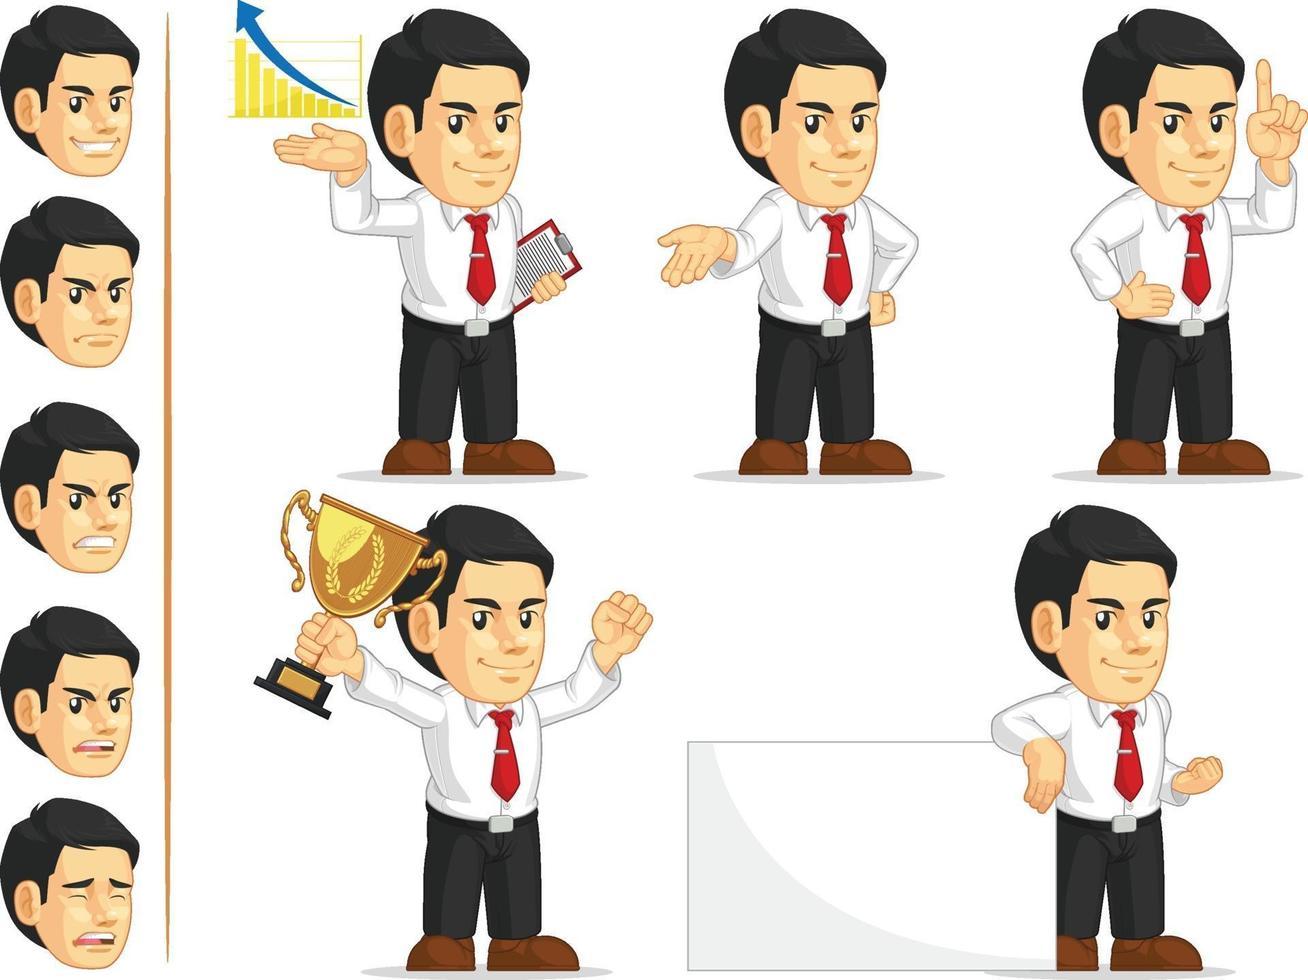 bedrijf kantoormedewerker corporate werknemer cartoon vector tekening